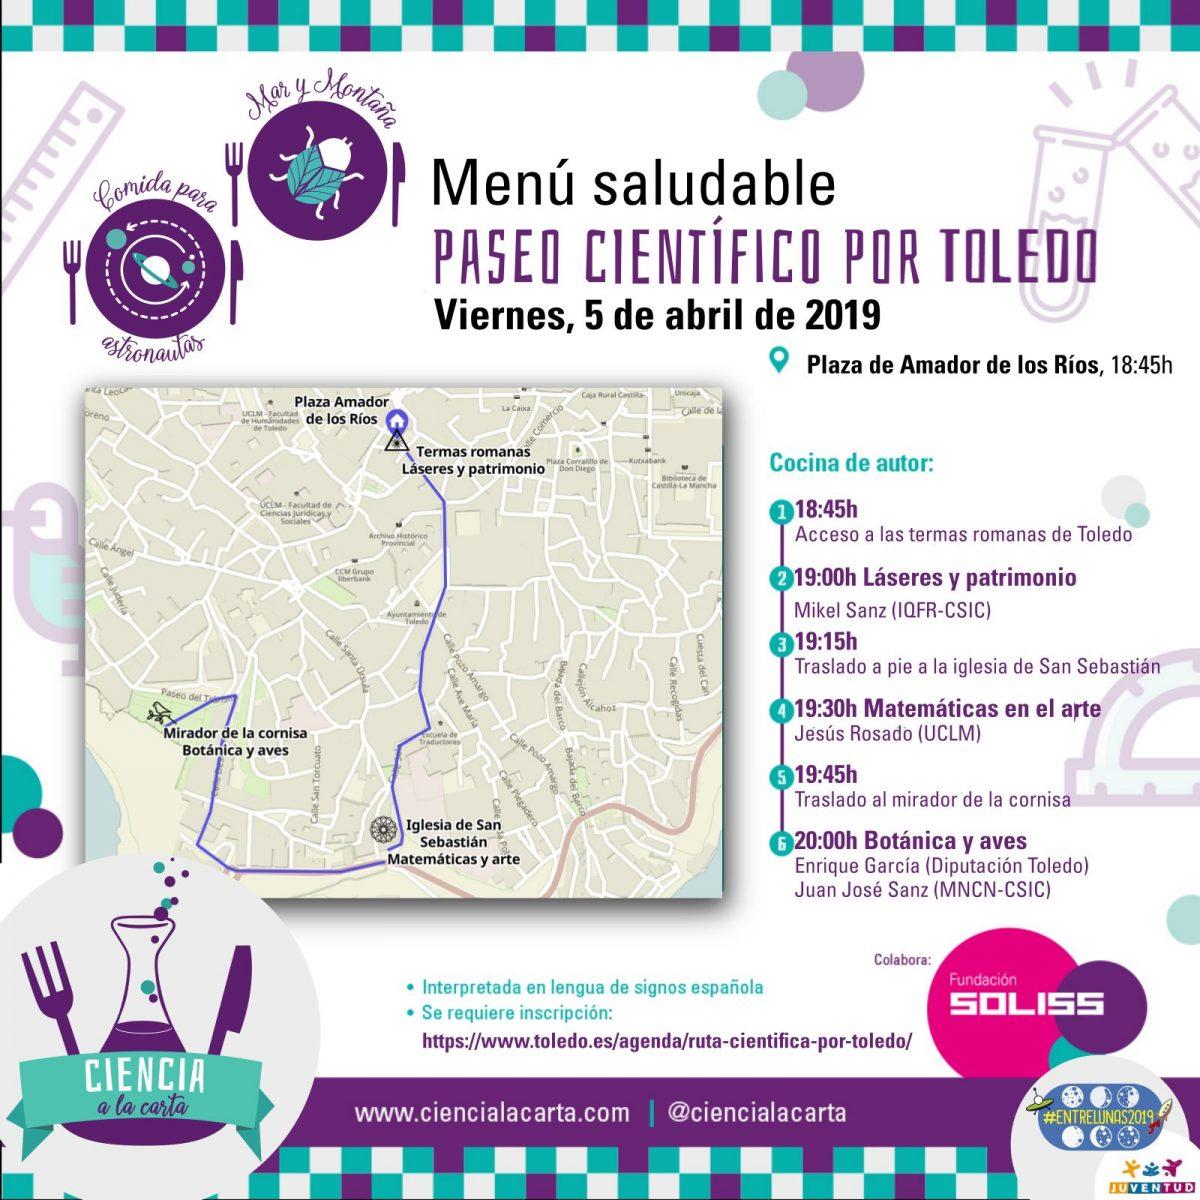 http://www.toledo.es/wp-content/uploads/2019/03/flyer-20x20-3-1200x1200.jpg. Paseo  científico por Toledo